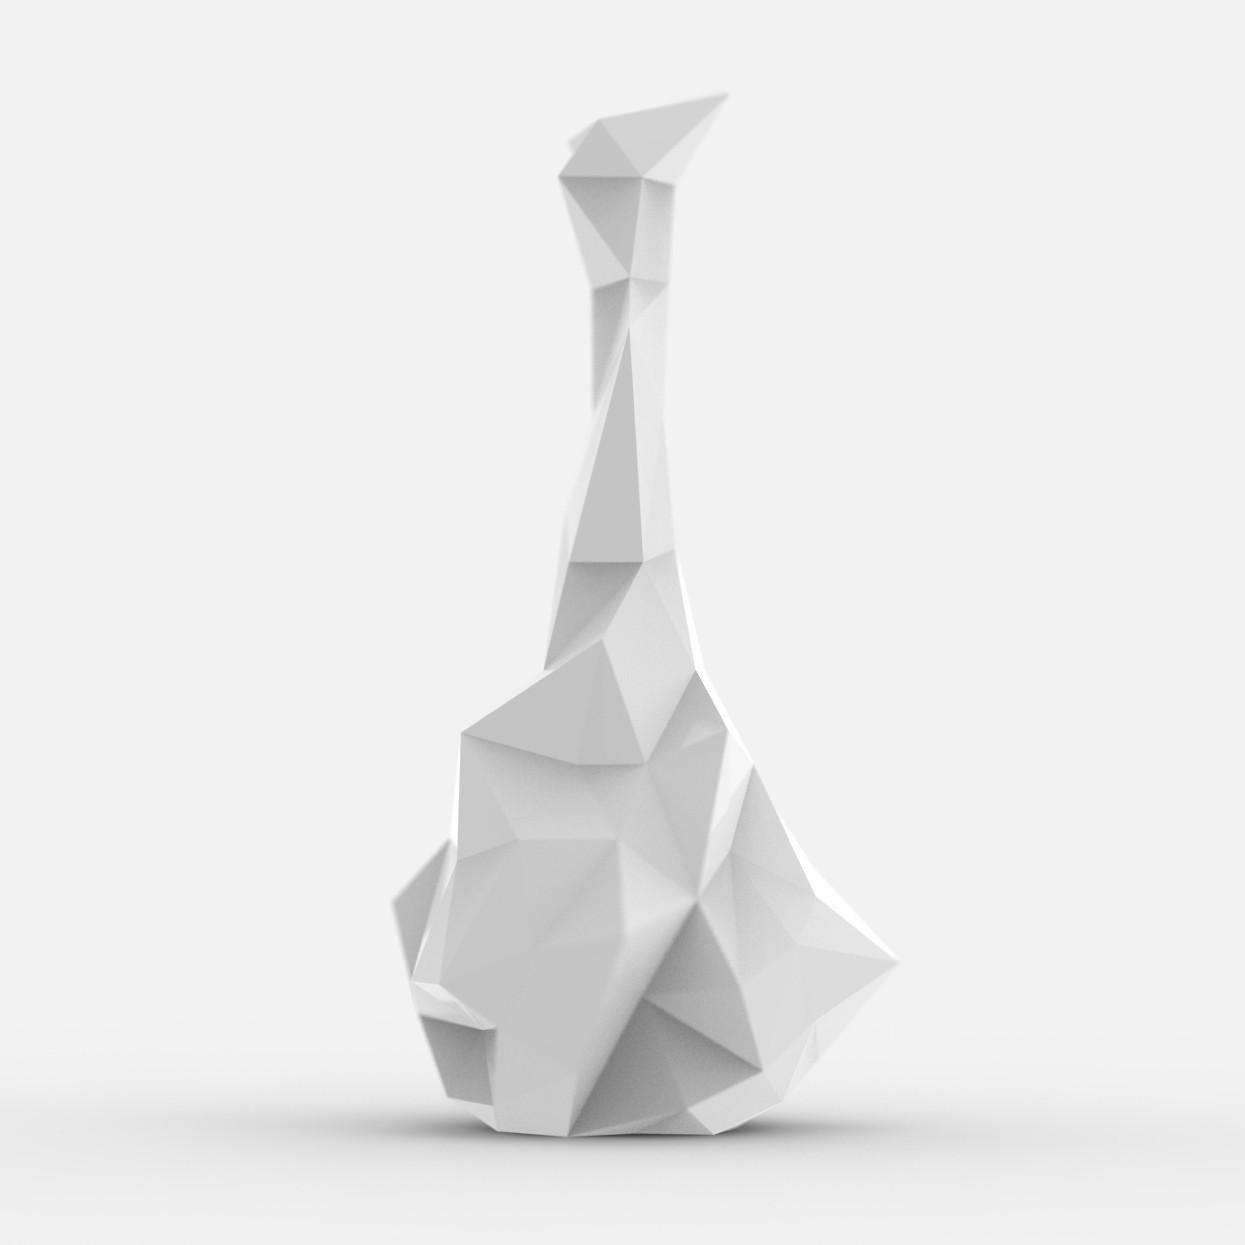 common_random_vase.348.jpg Download free STL file Common Random Vase • Design to 3D print, IDEABOX